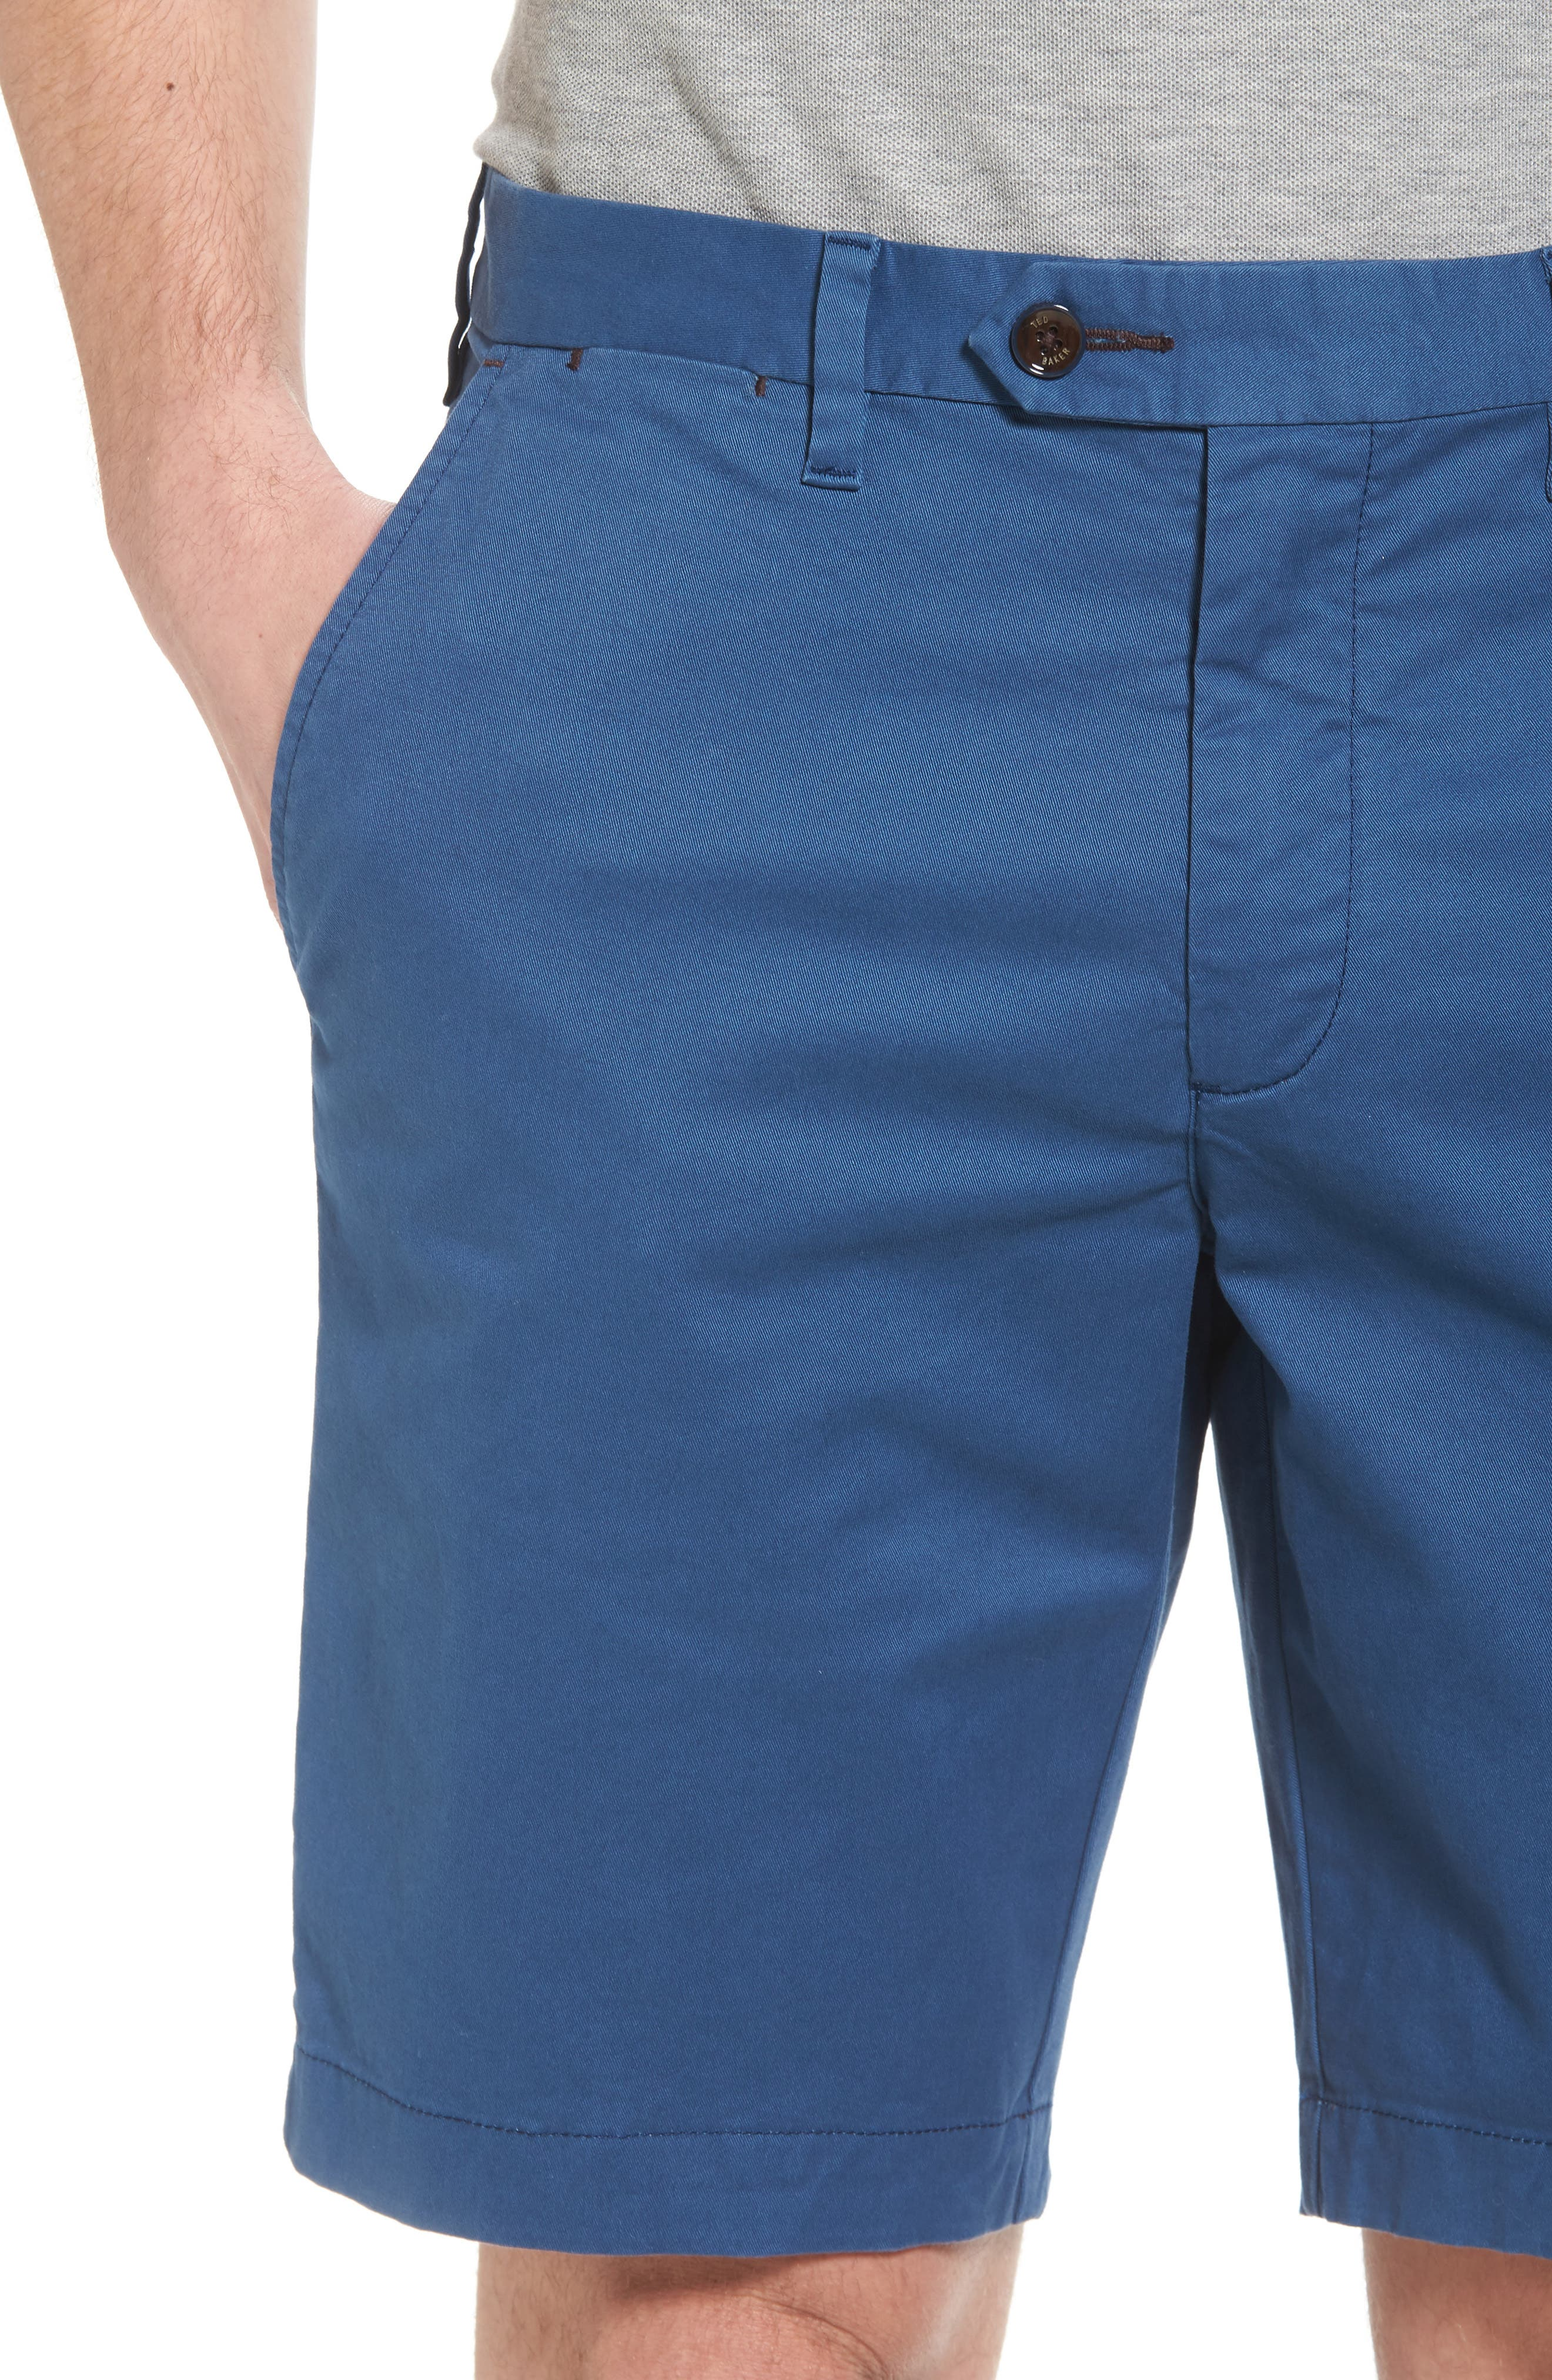 Proshor Slim Fit Chino Shorts,                             Alternate thumbnail 6, color,                             Dark Blue